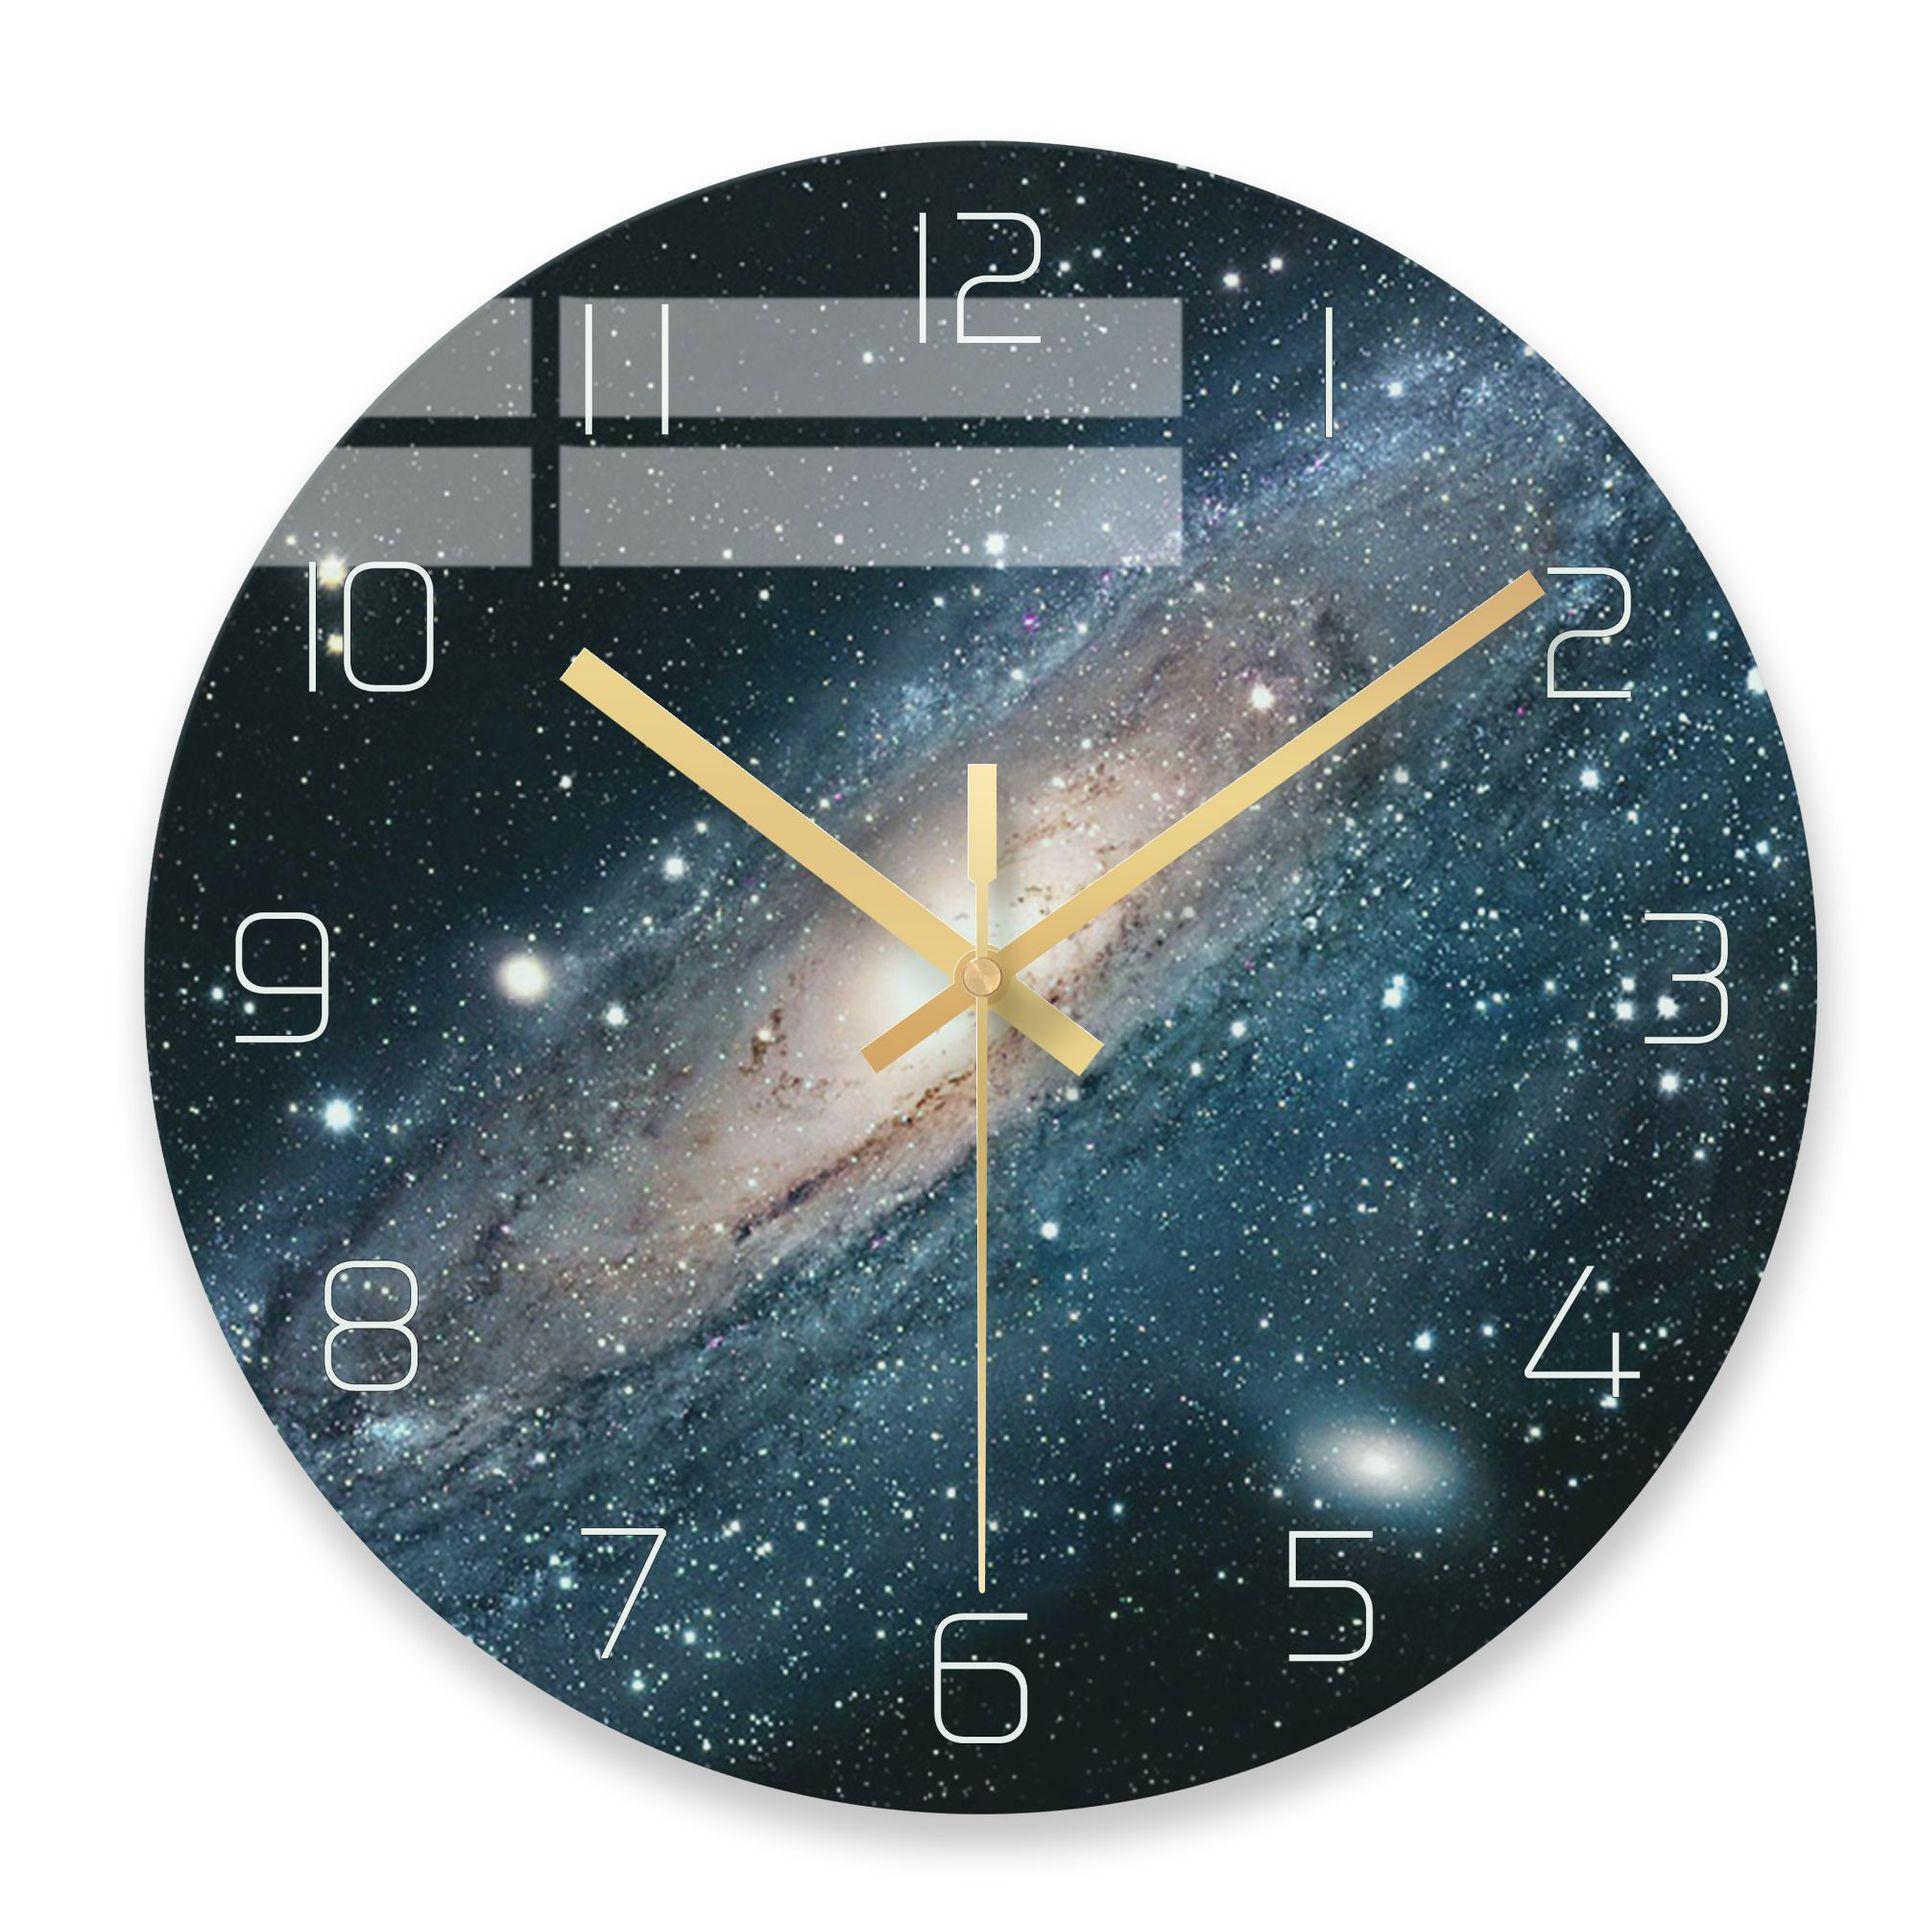 Nordic Minimalist Creative Transparent Glass Wall Clock Modern Home Clock Study Mute Clock Fashion Decorative Quartz Clock